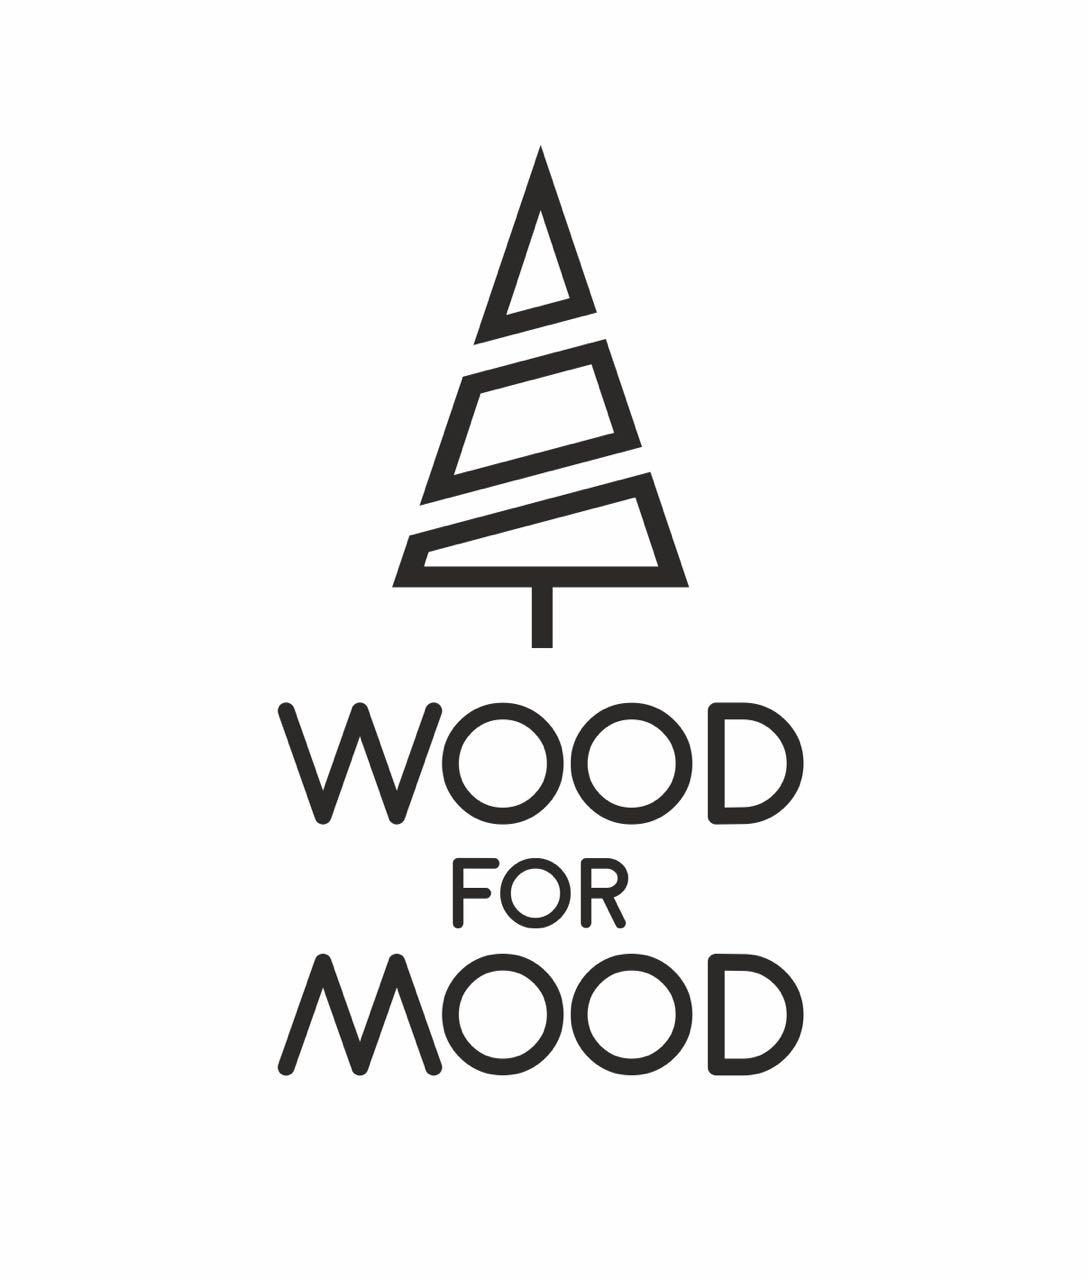 Wood for Mood